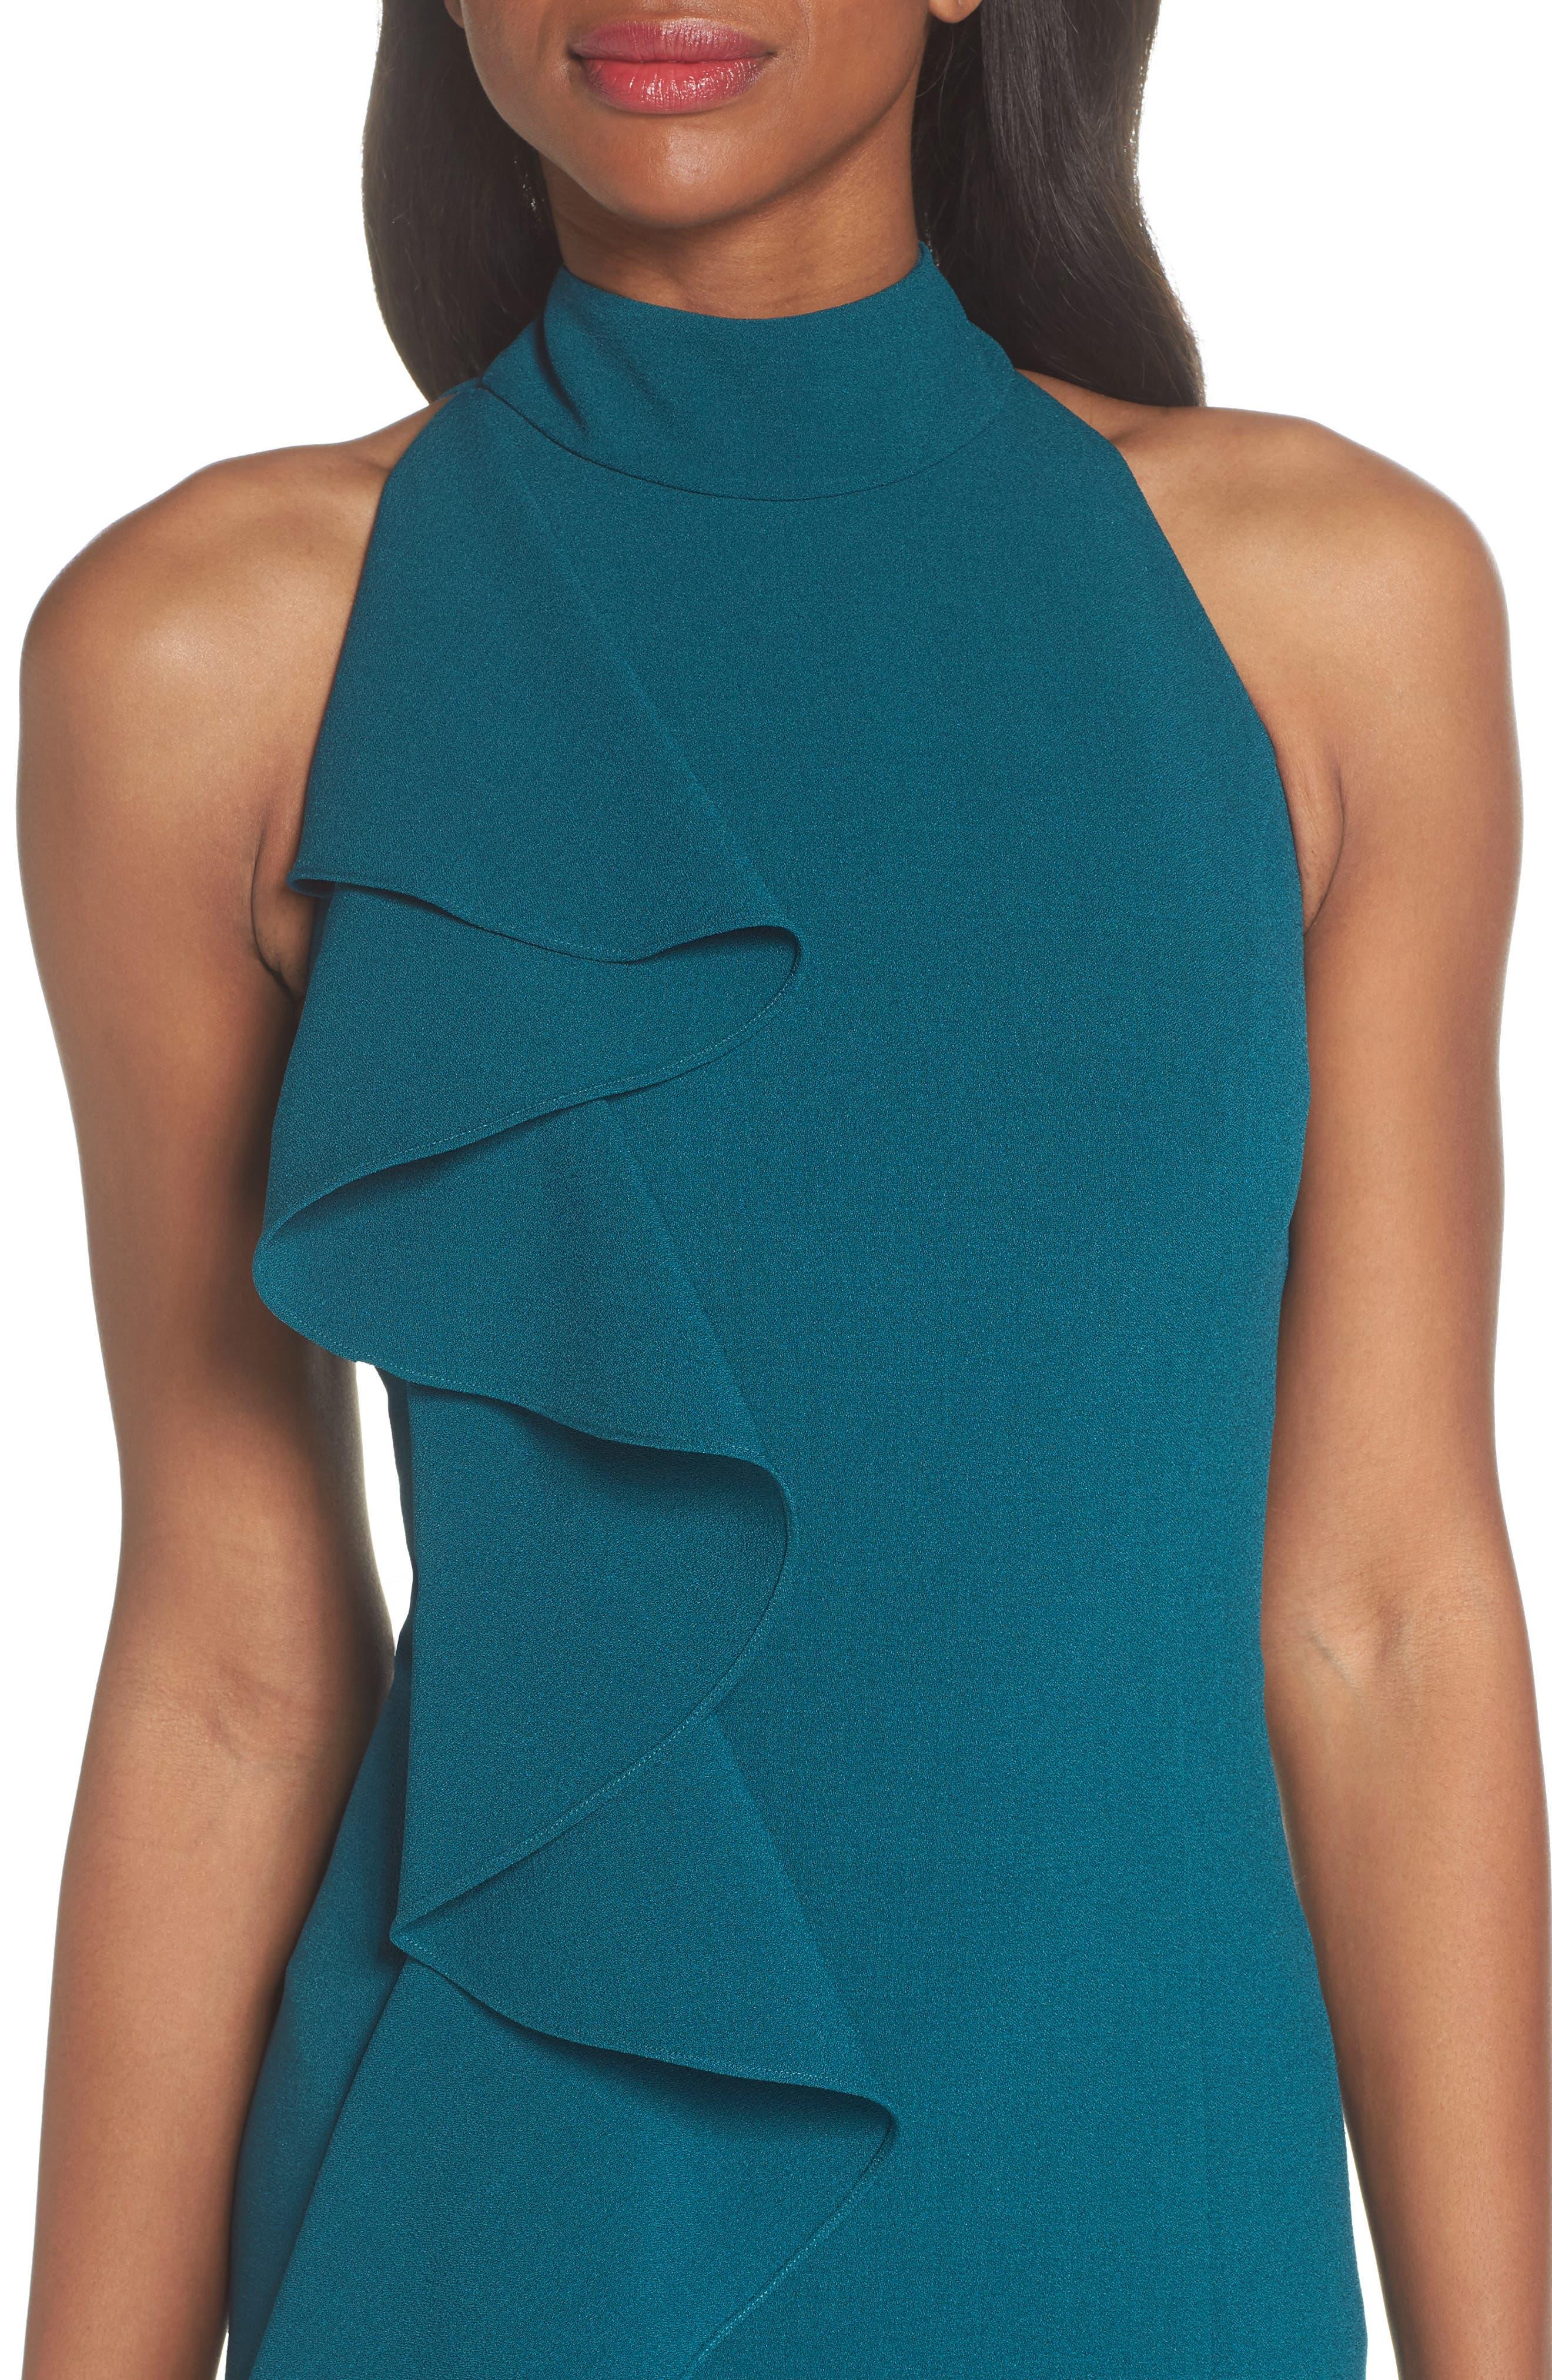 Ruffle Sheath Dress,                             Alternate thumbnail 4, color,                             Peacock